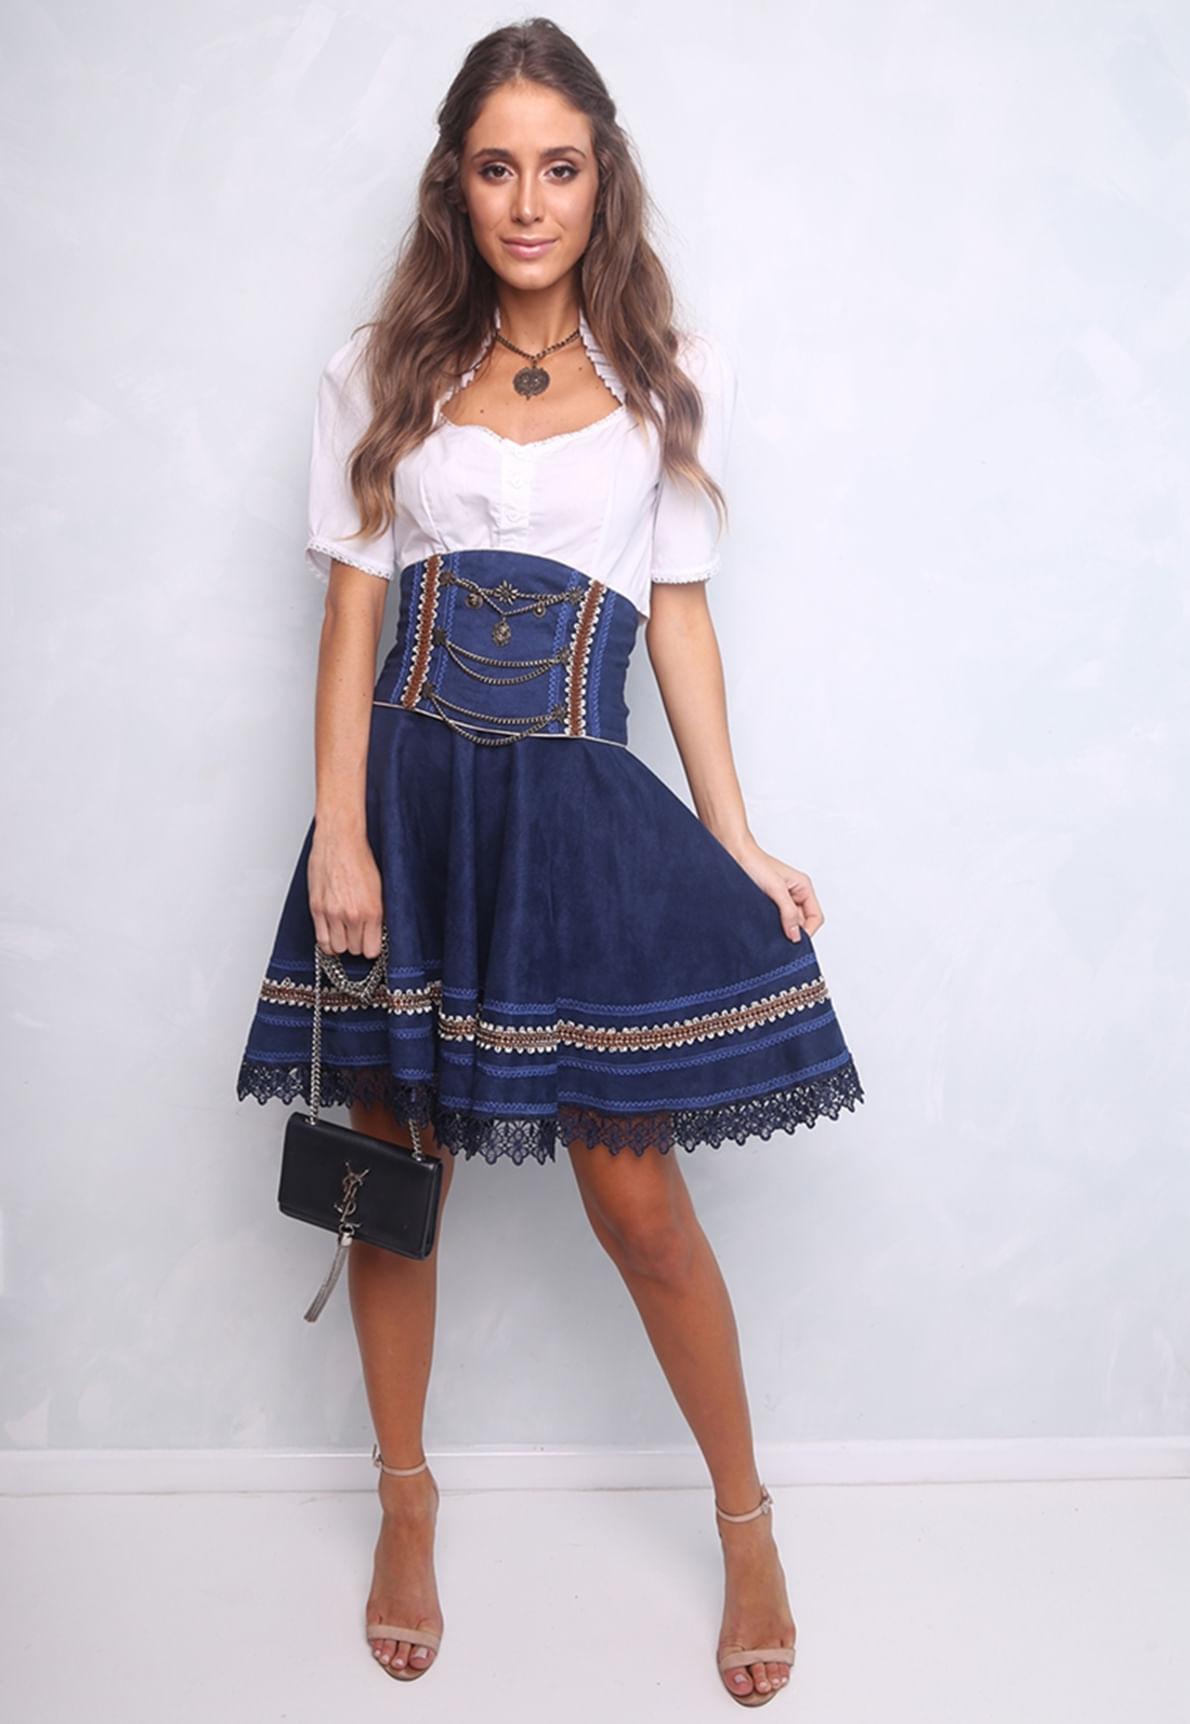 28291-traje-oktober-vestido-azul-dusseldorf-01